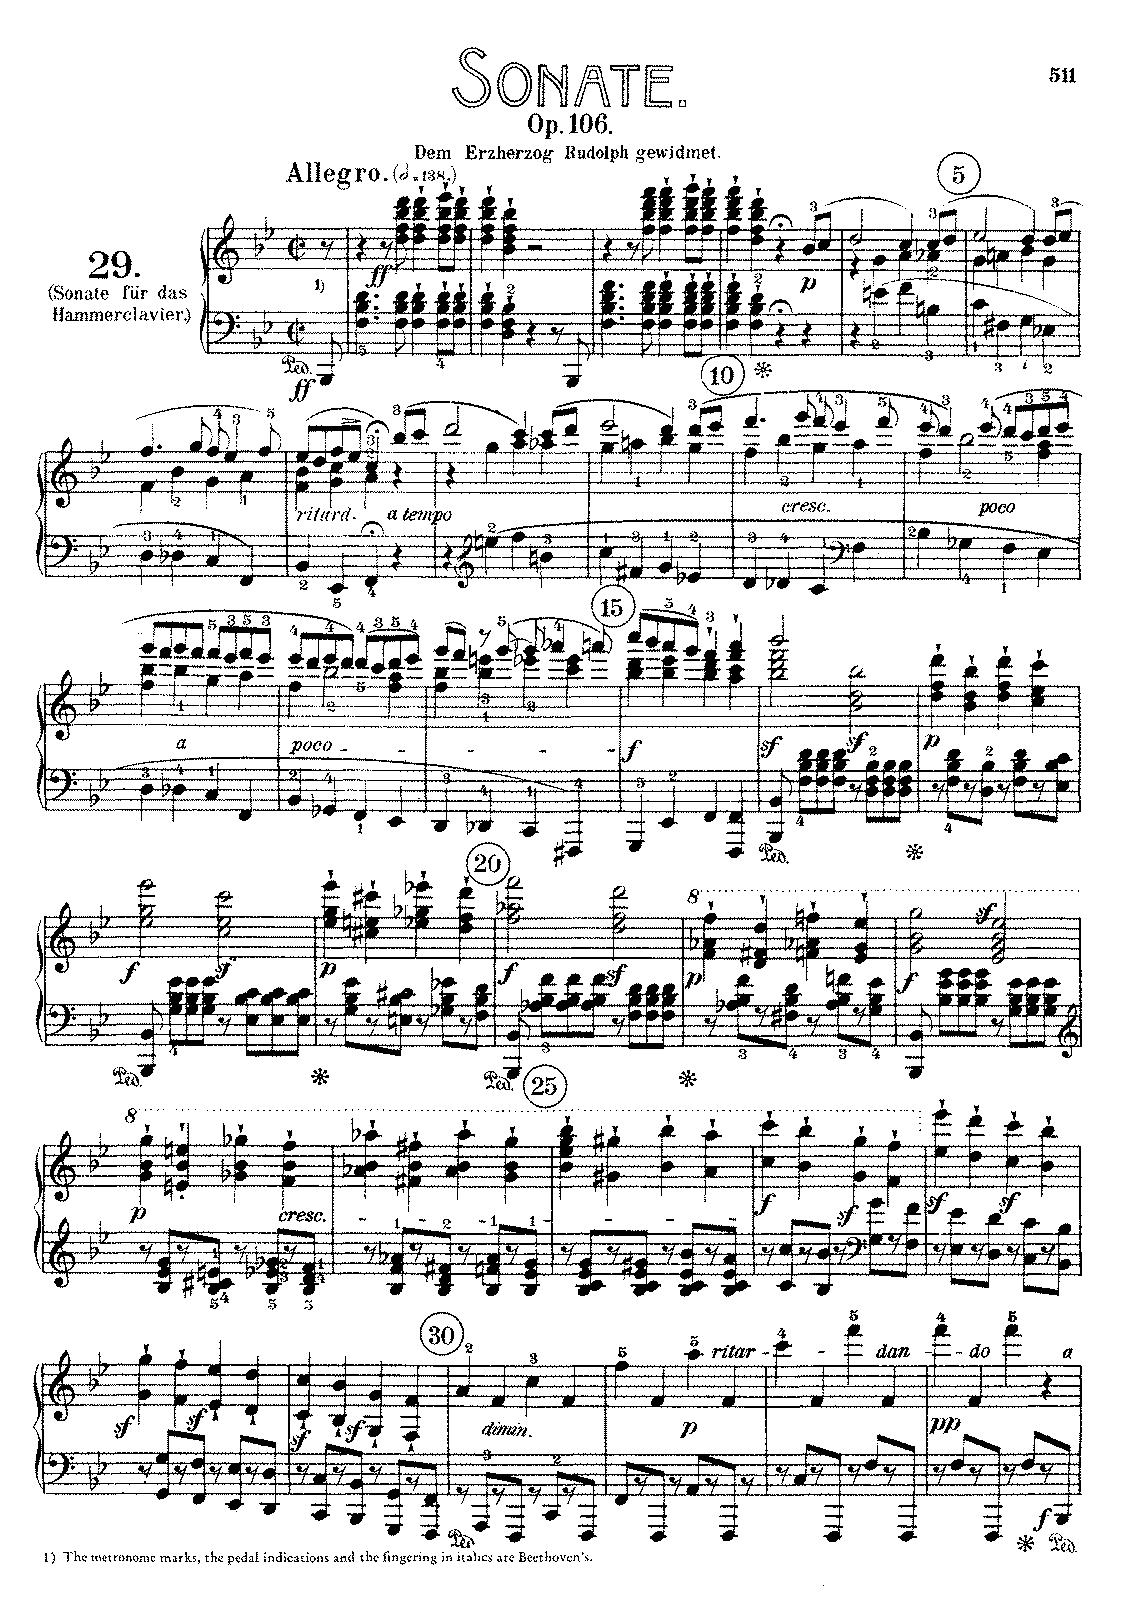 Op. 106